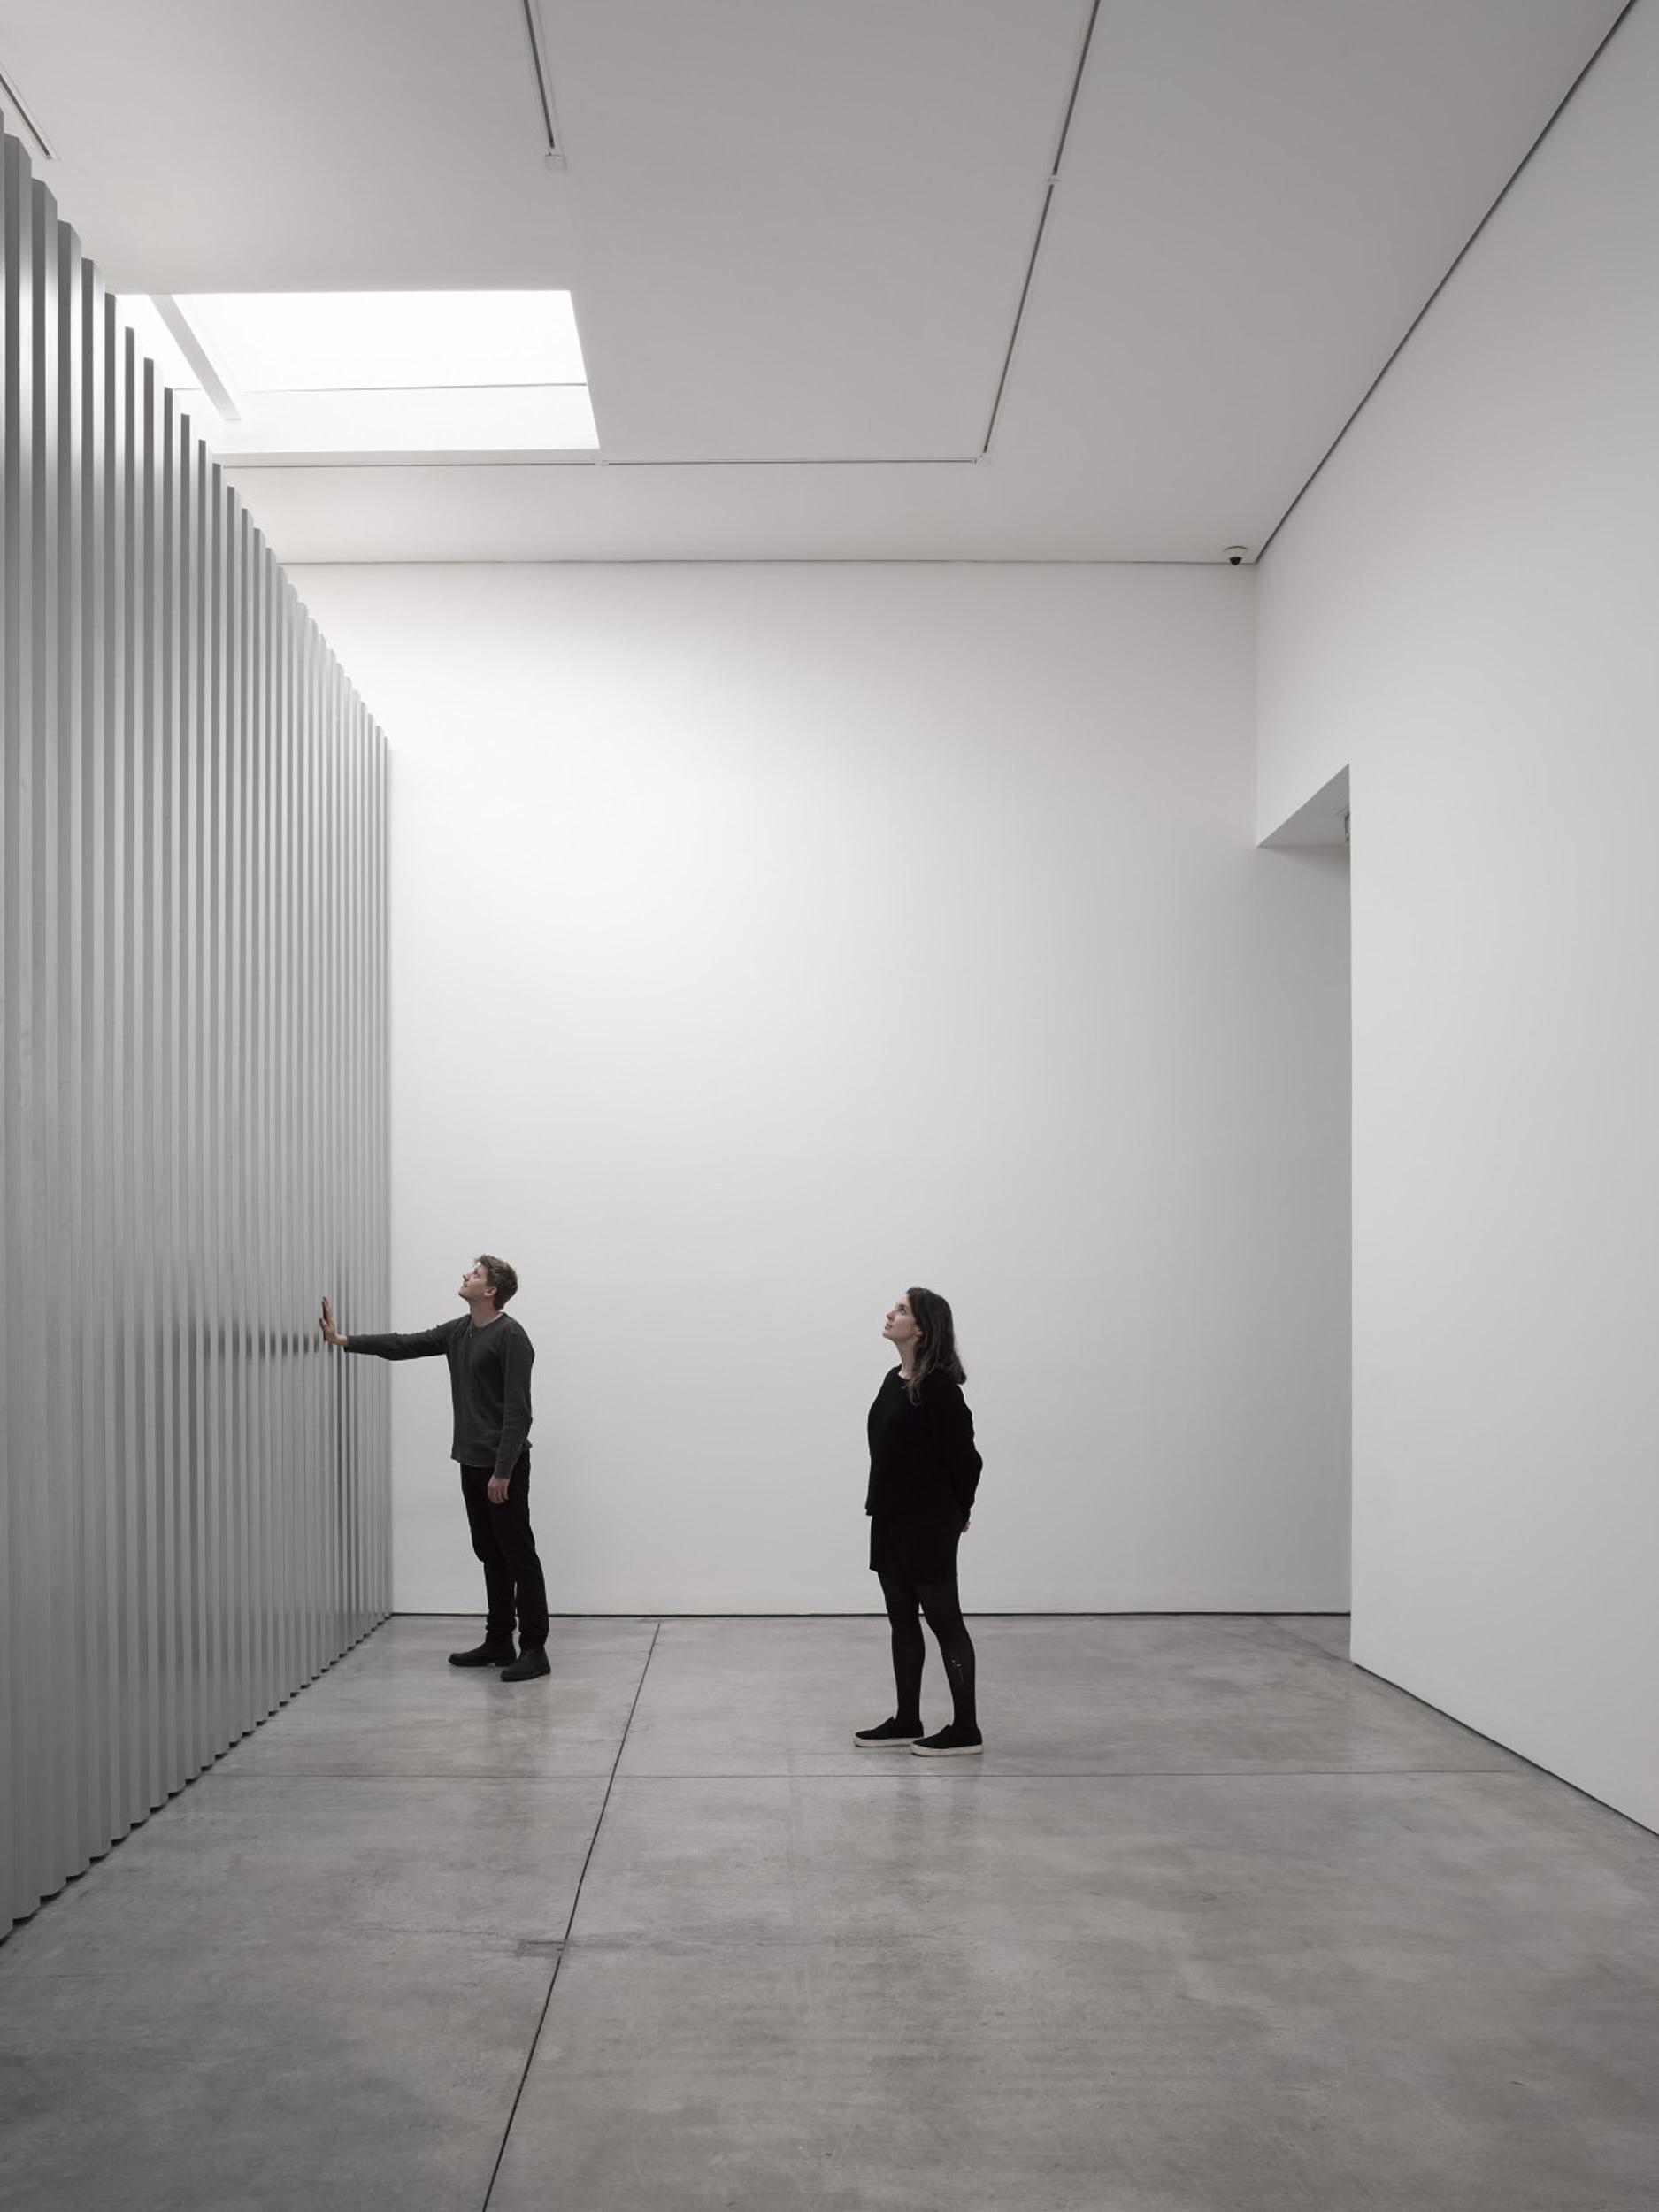 Random Access Memory by Miroslaw Balka Presented at White Cube, London on Anniversary Magazine